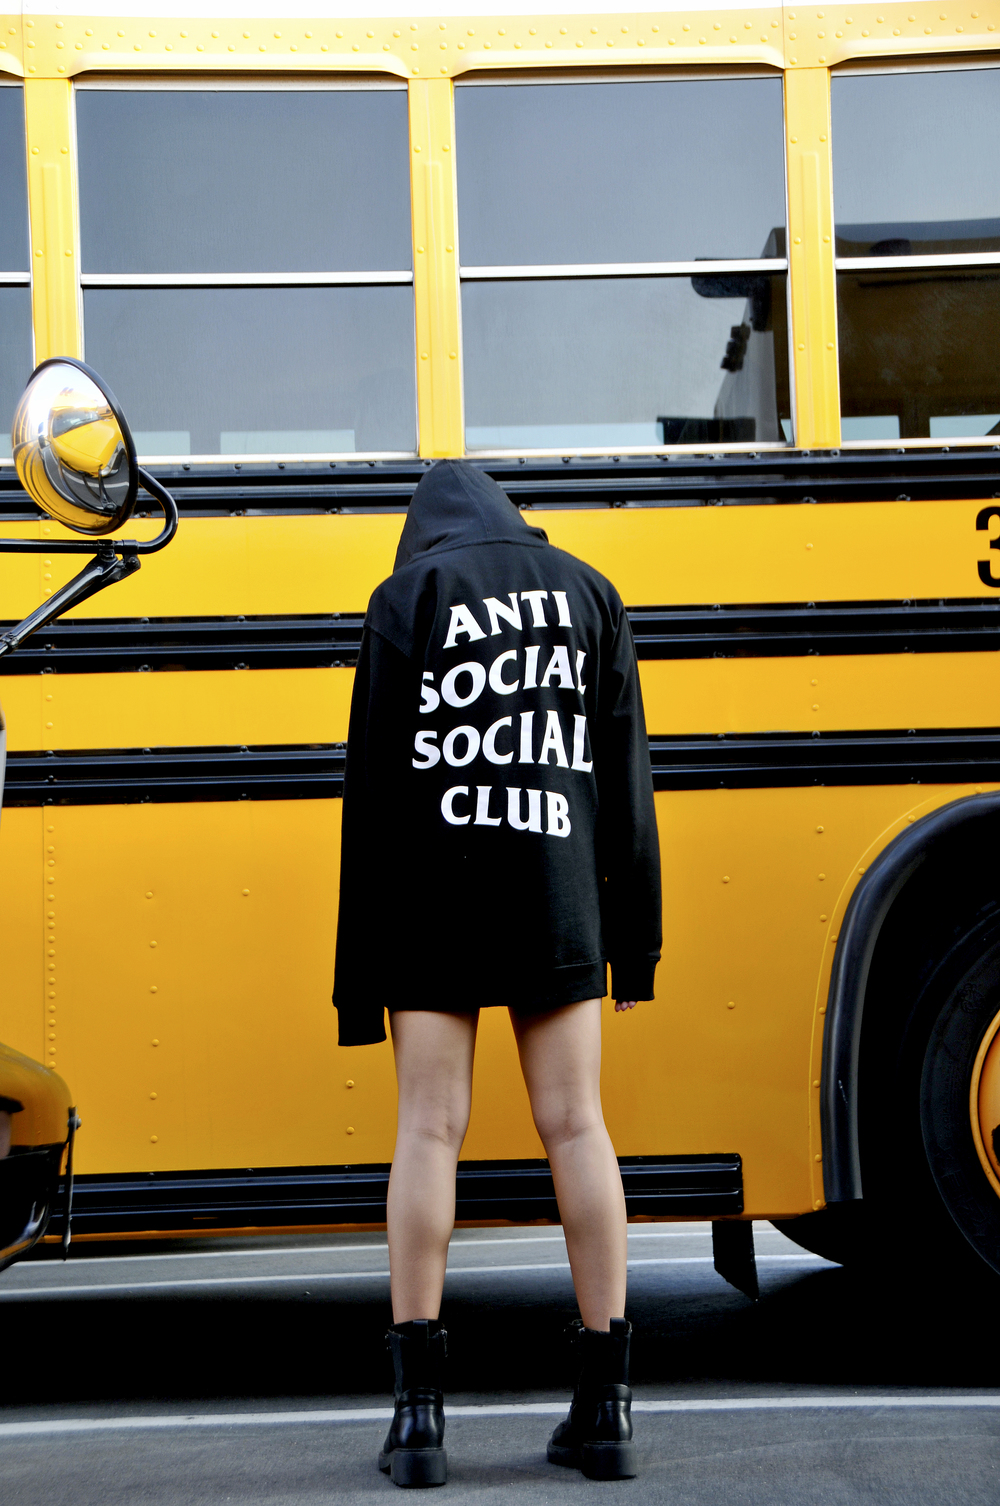 antisocial_bus_4